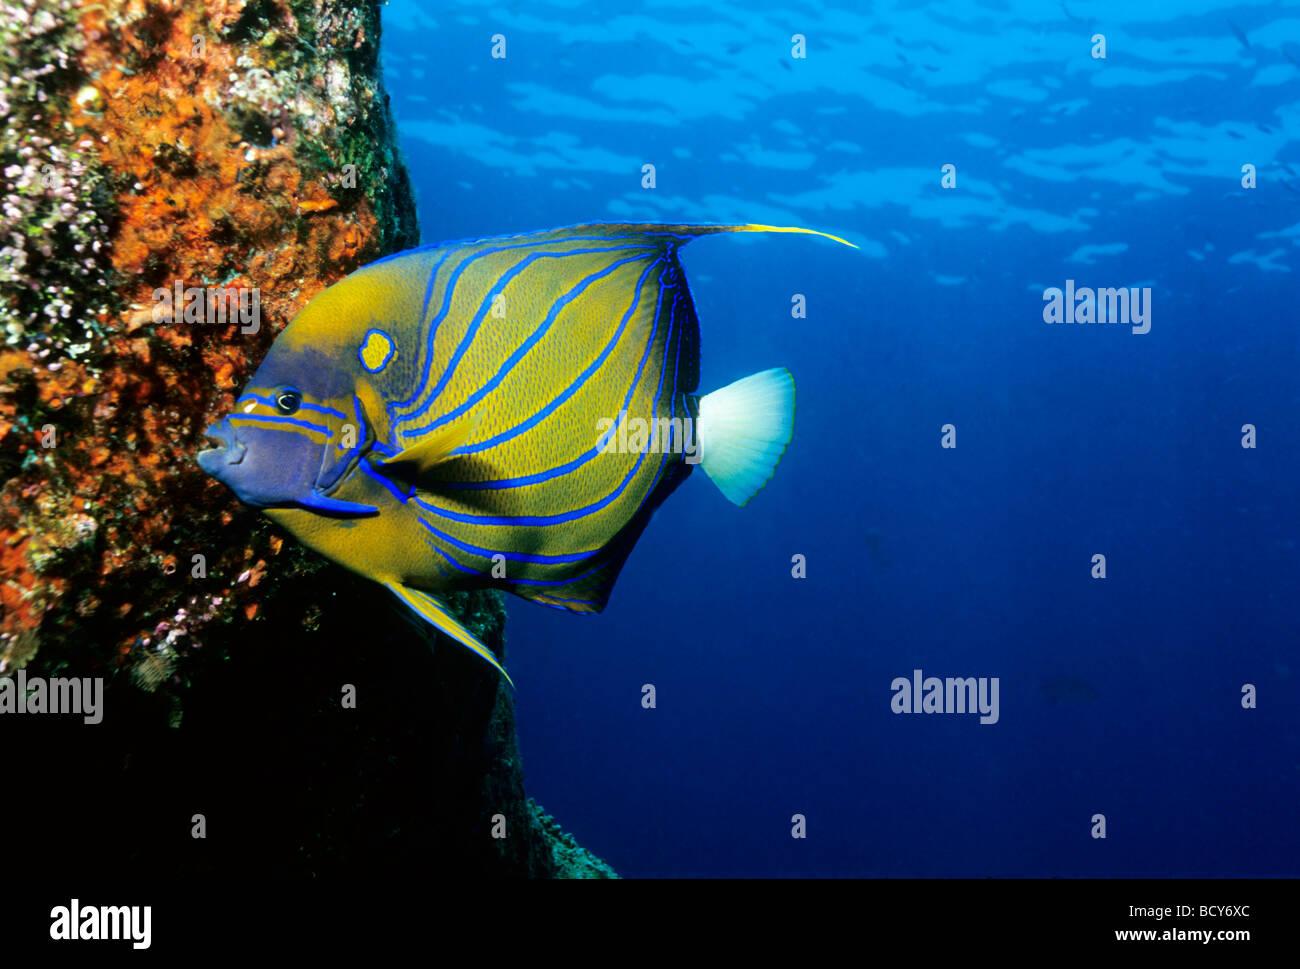 Blue-Ring Angelfish (Pomacanthus annularis) feeding on red fungi, Similan Islands, Andaman Sea, Thailand, Asia, - Stock Image